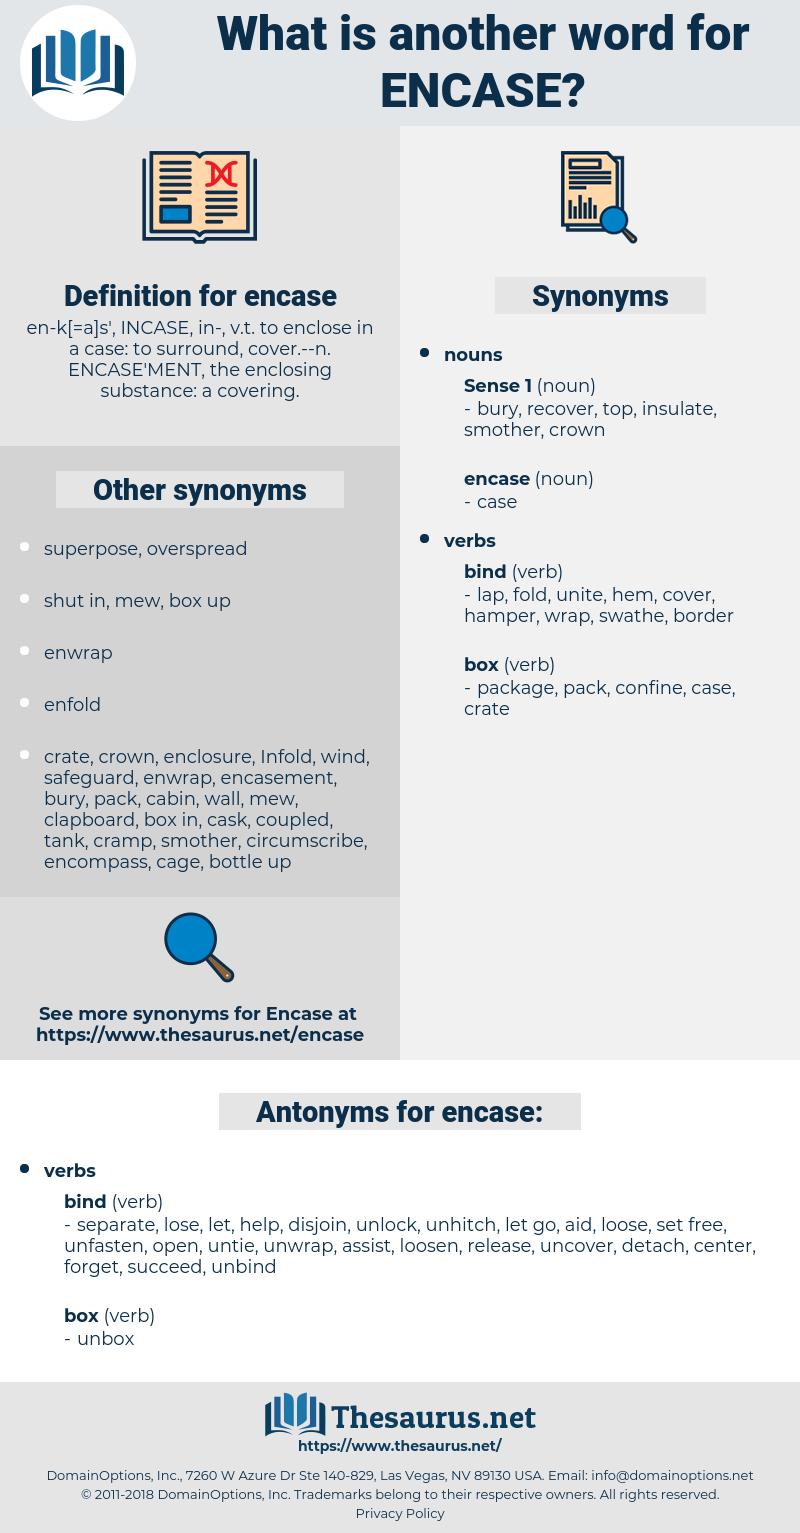 encase, synonym encase, another word for encase, words like encase, thesaurus encase